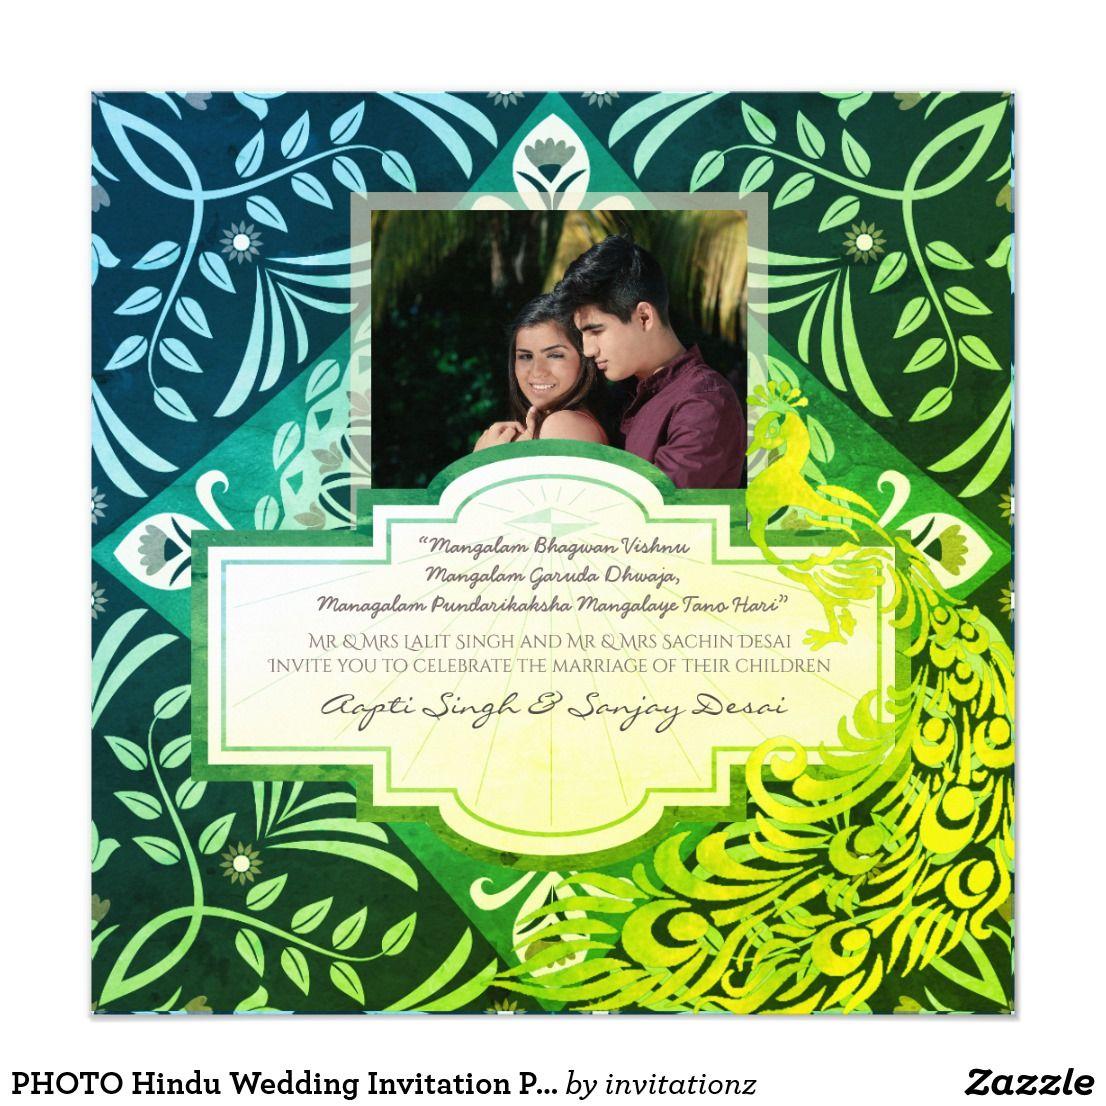 Photo Hindu Wedding Invitation Peacock Green Trending Wedding